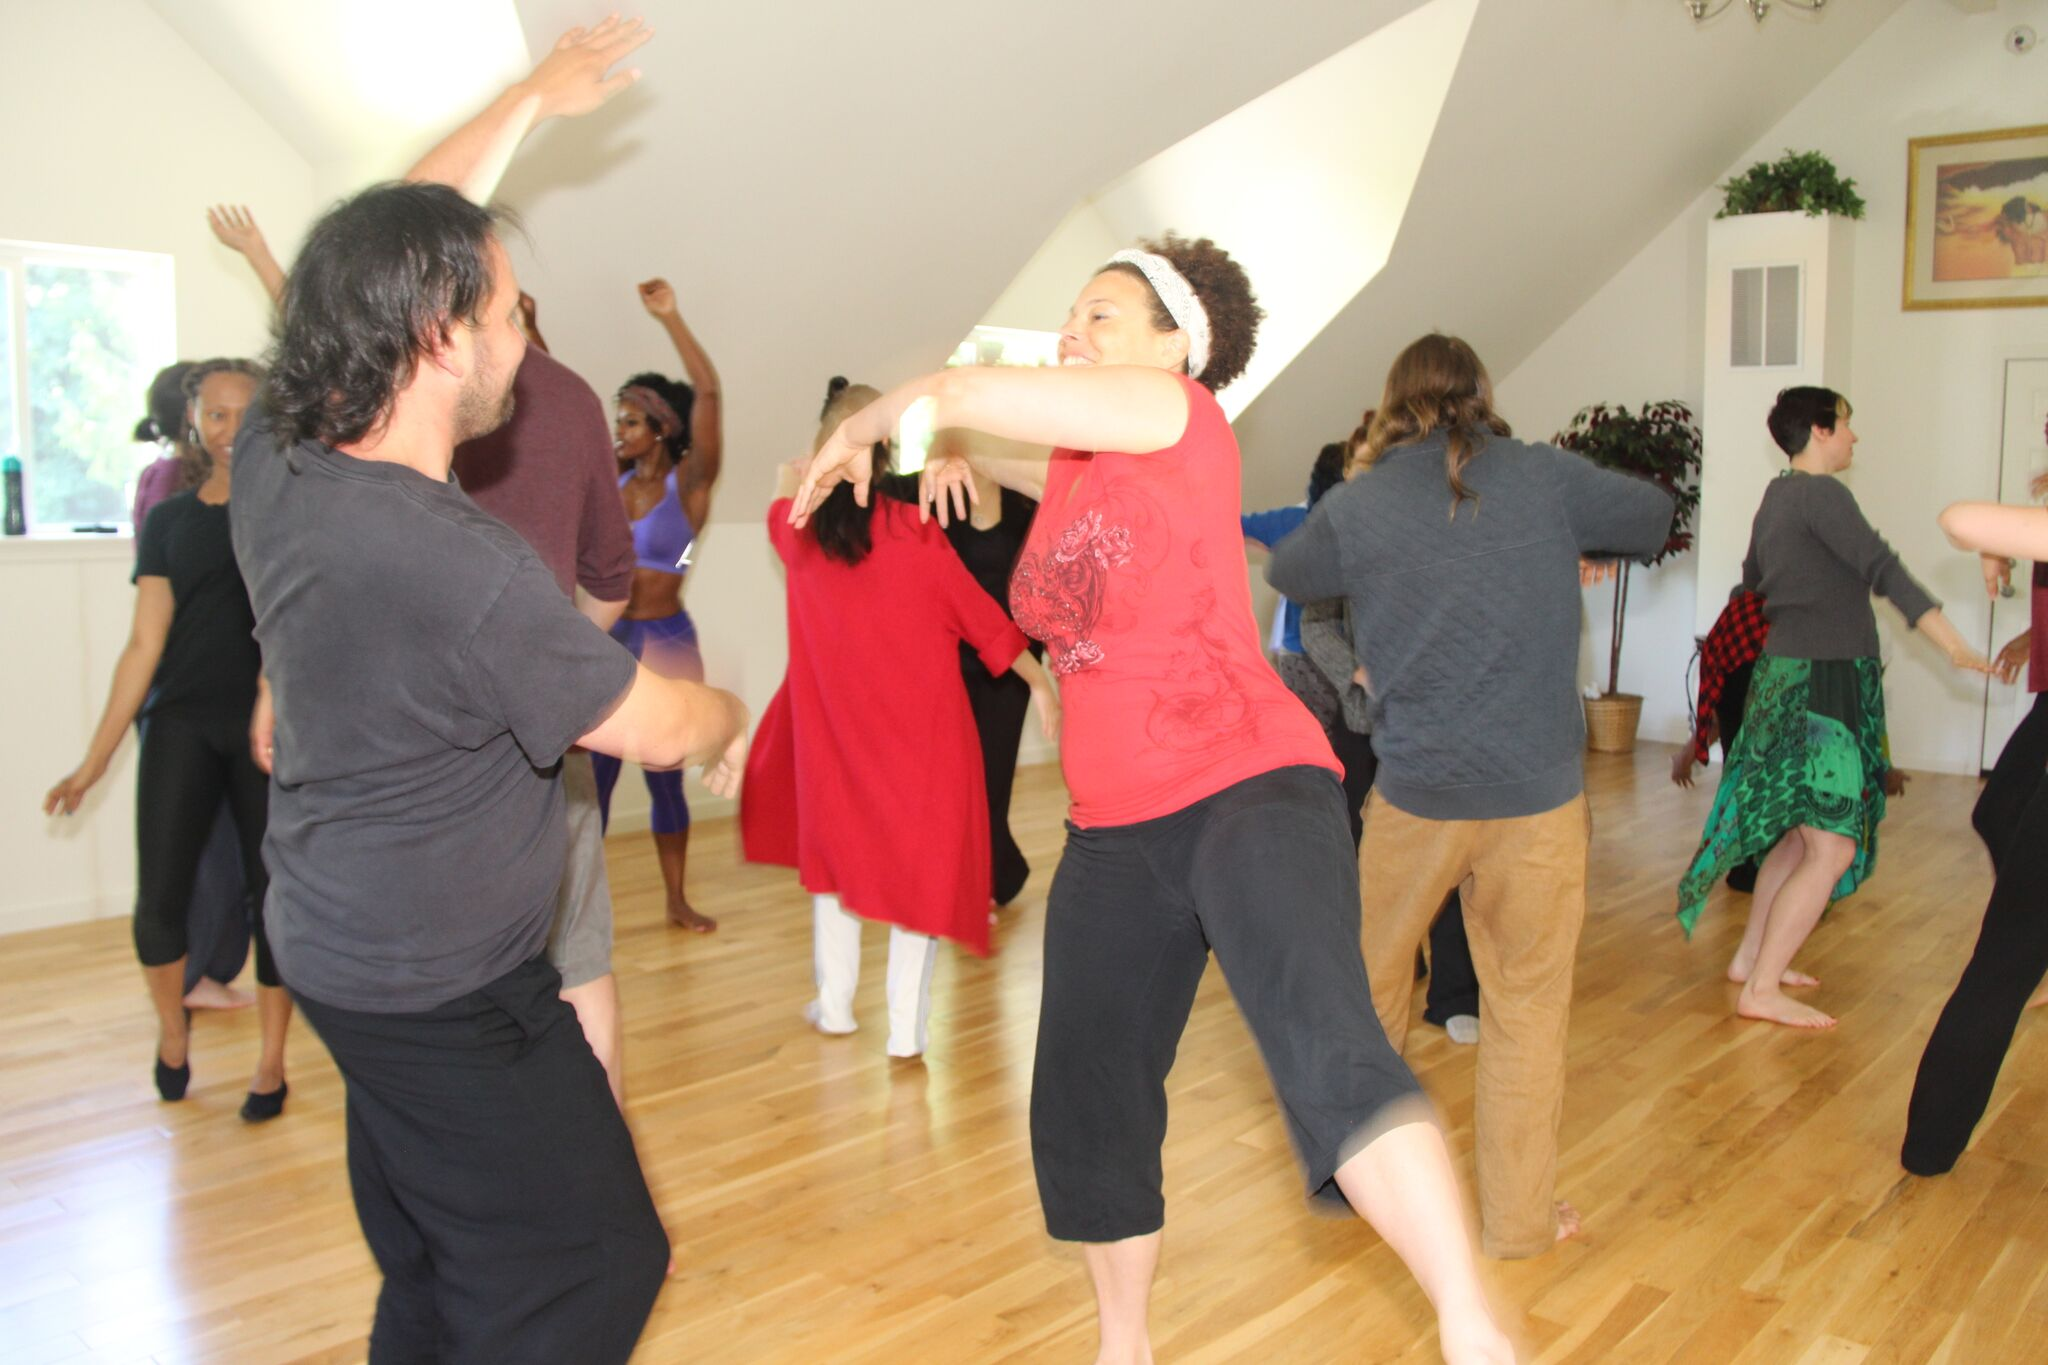 authentic tantra | tantric practices